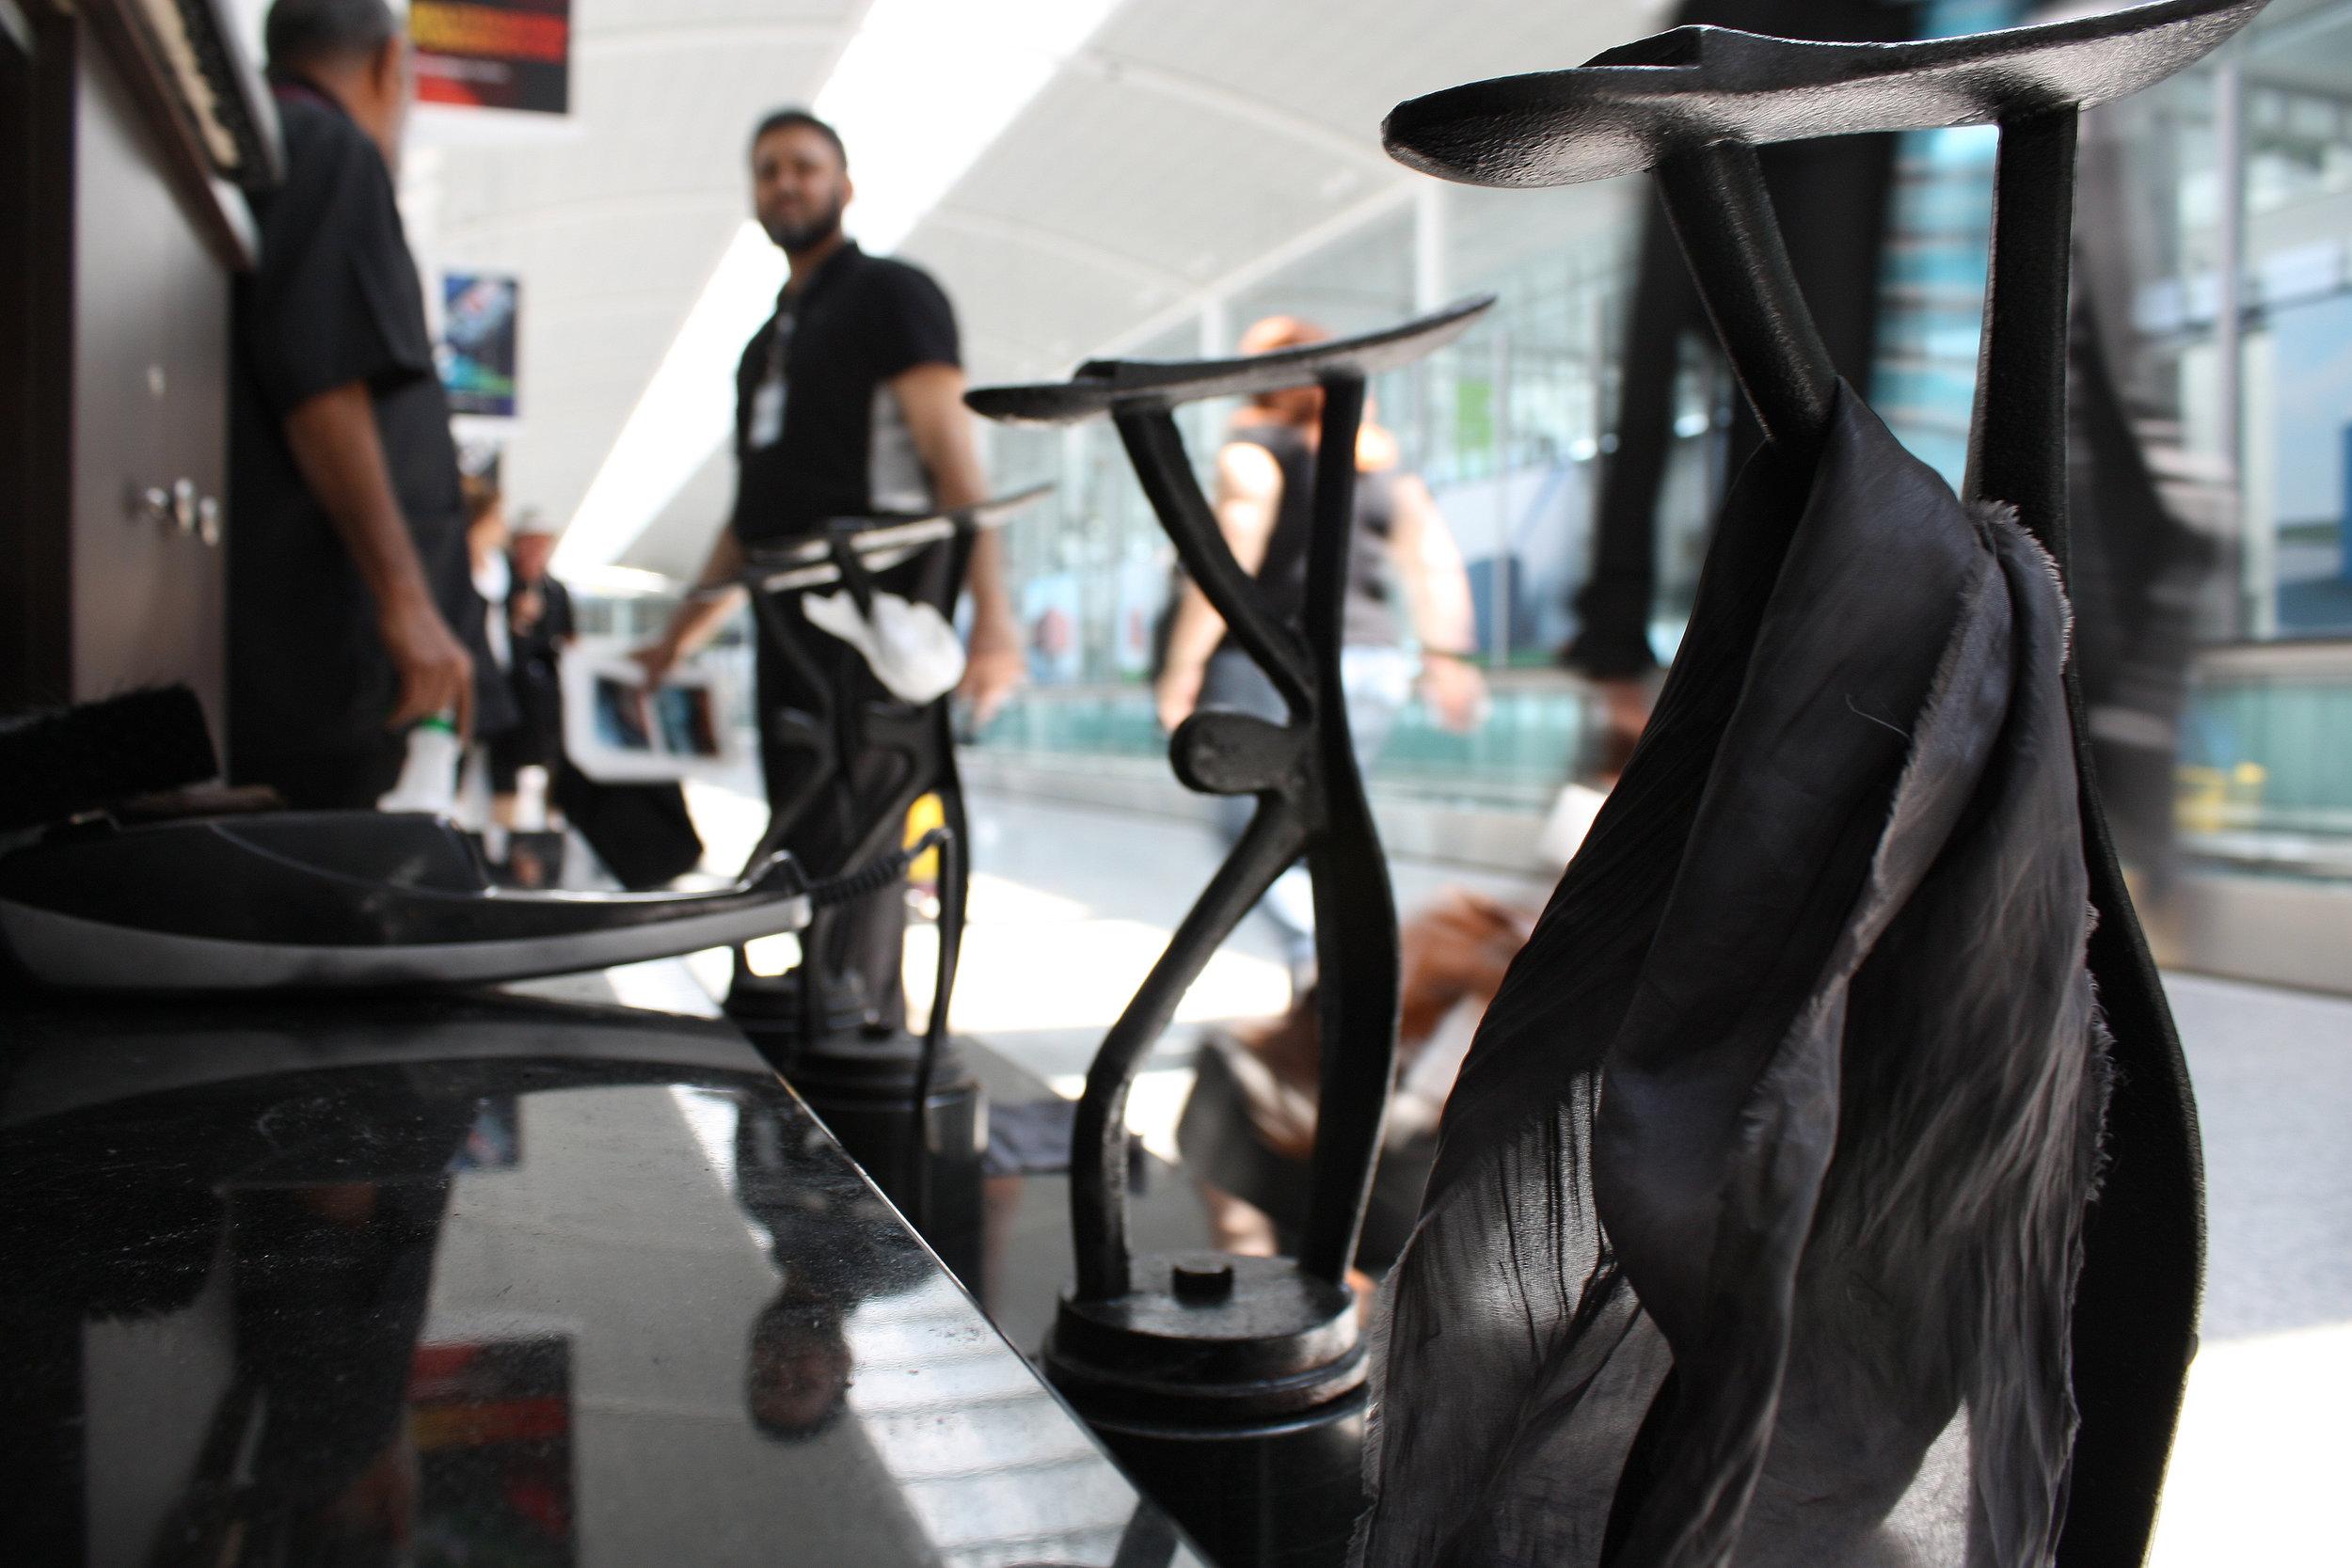 Walter's Shoe Shine Parlour - site image 2.jpg